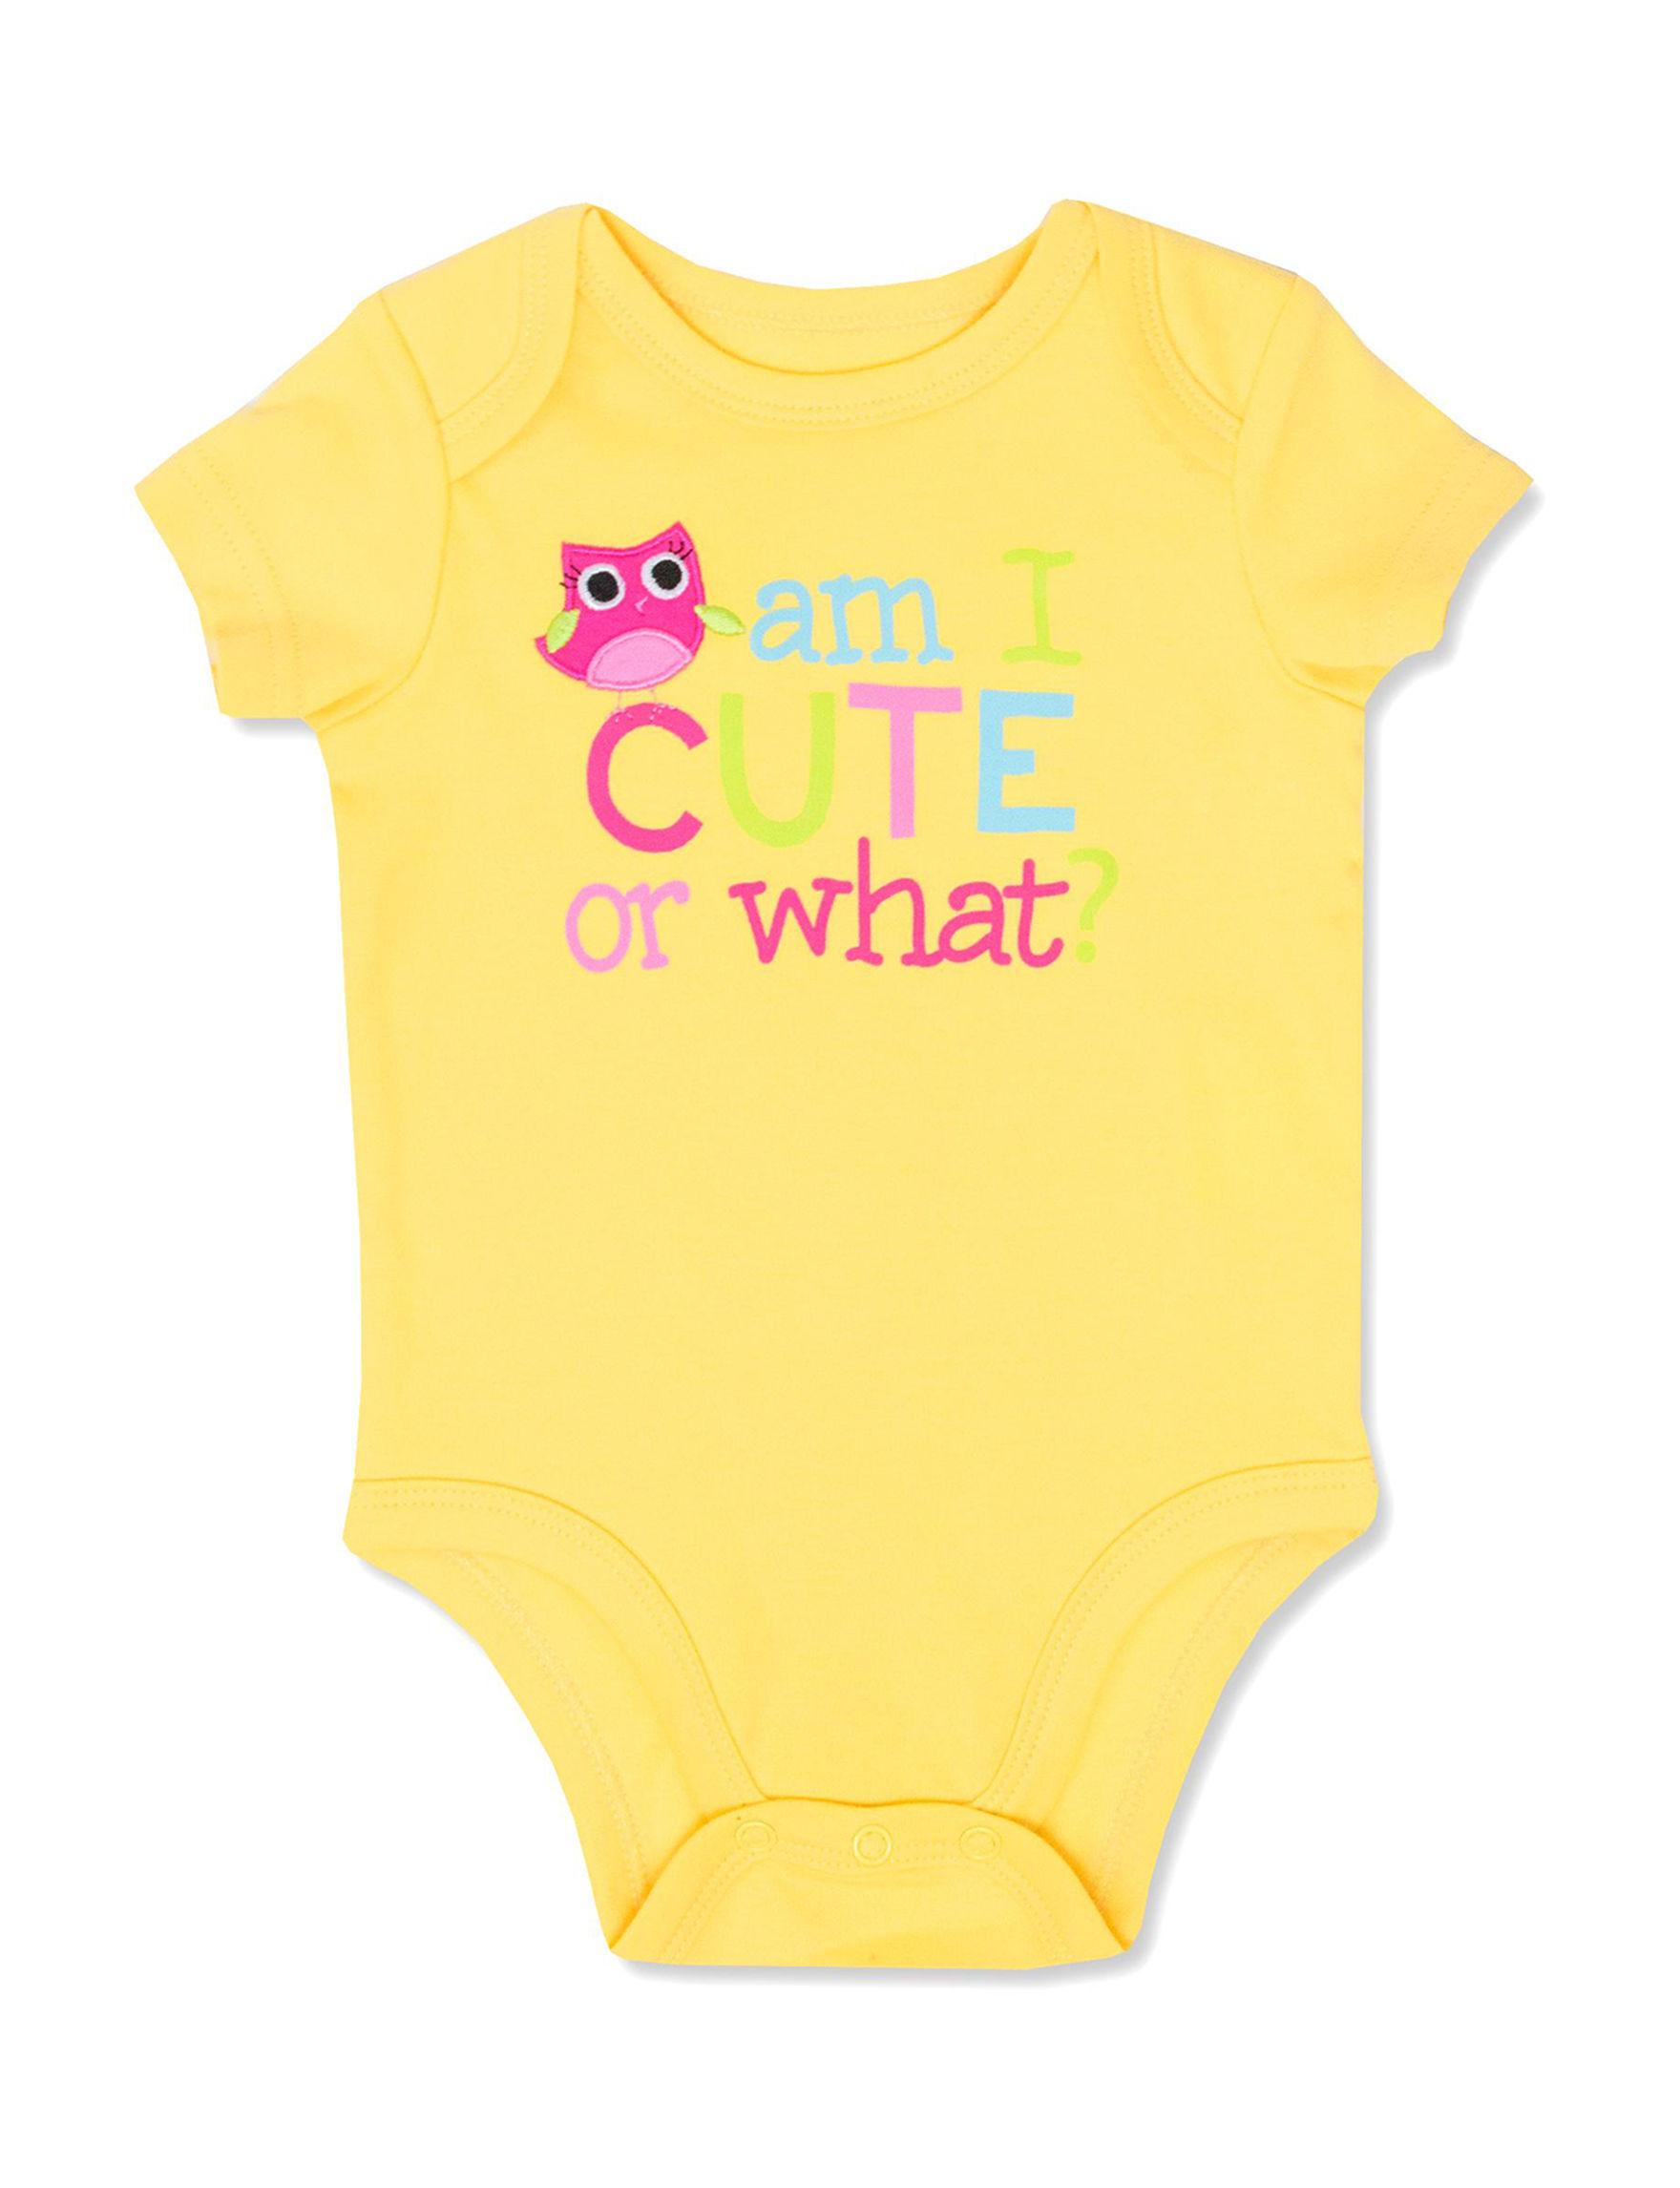 Baby Essentials Yellow